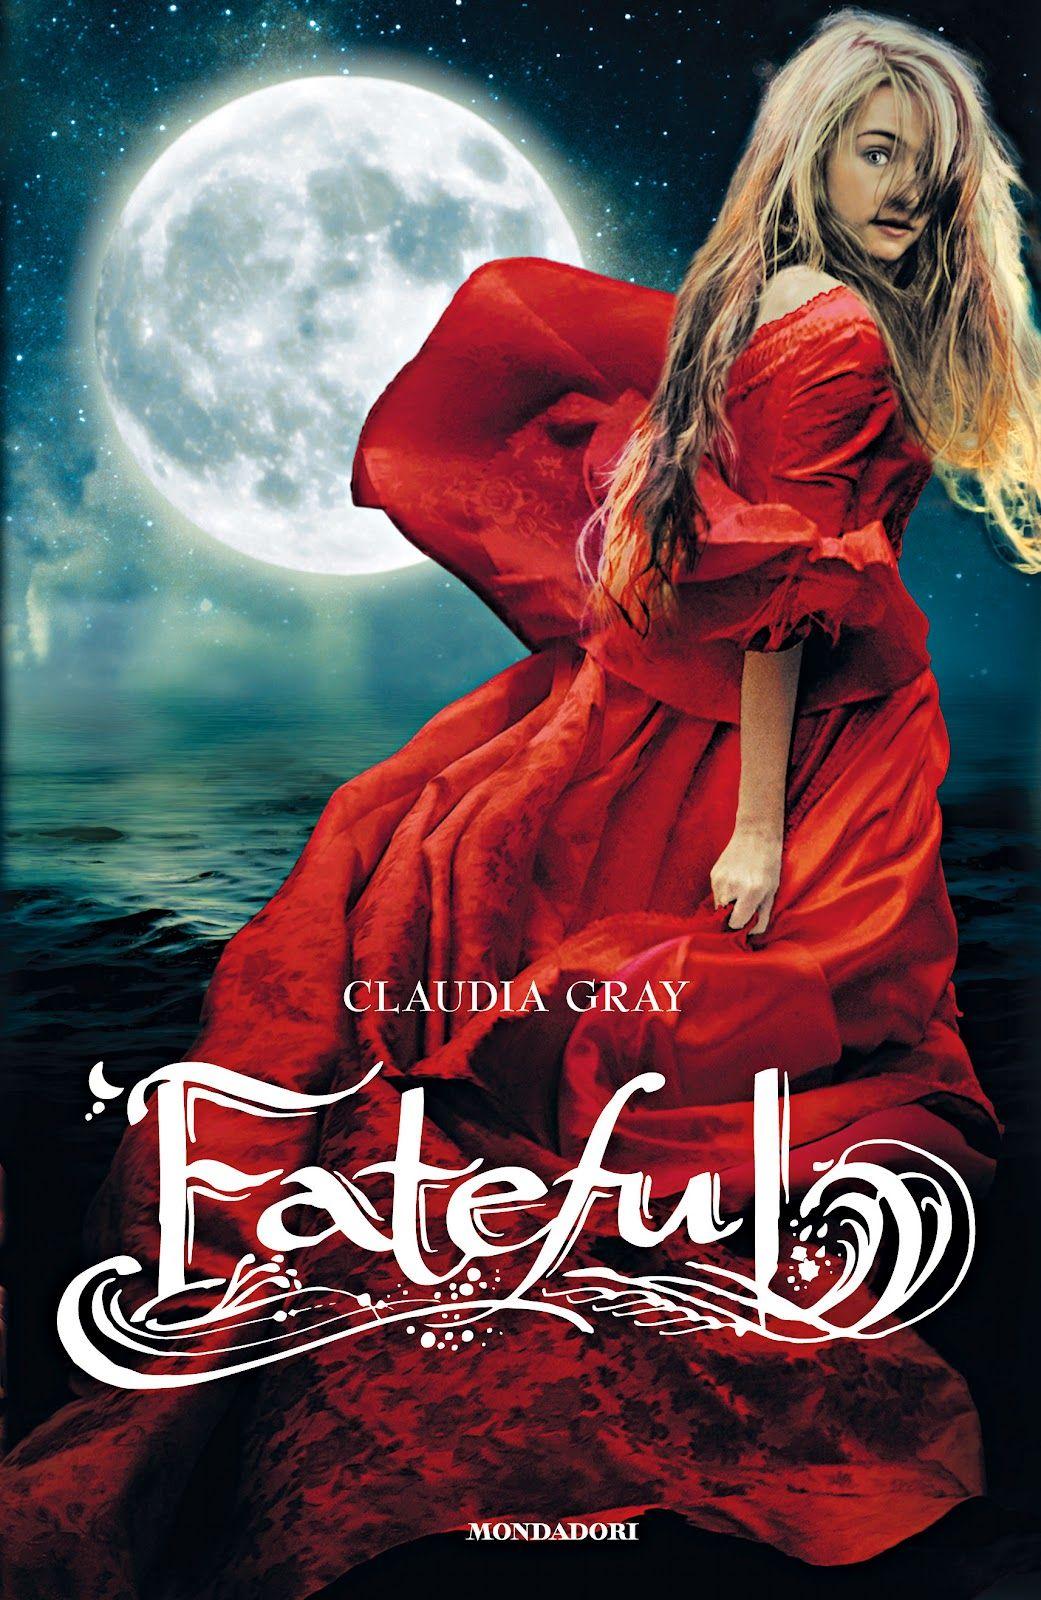 Claudia gray fateful romance books books to read